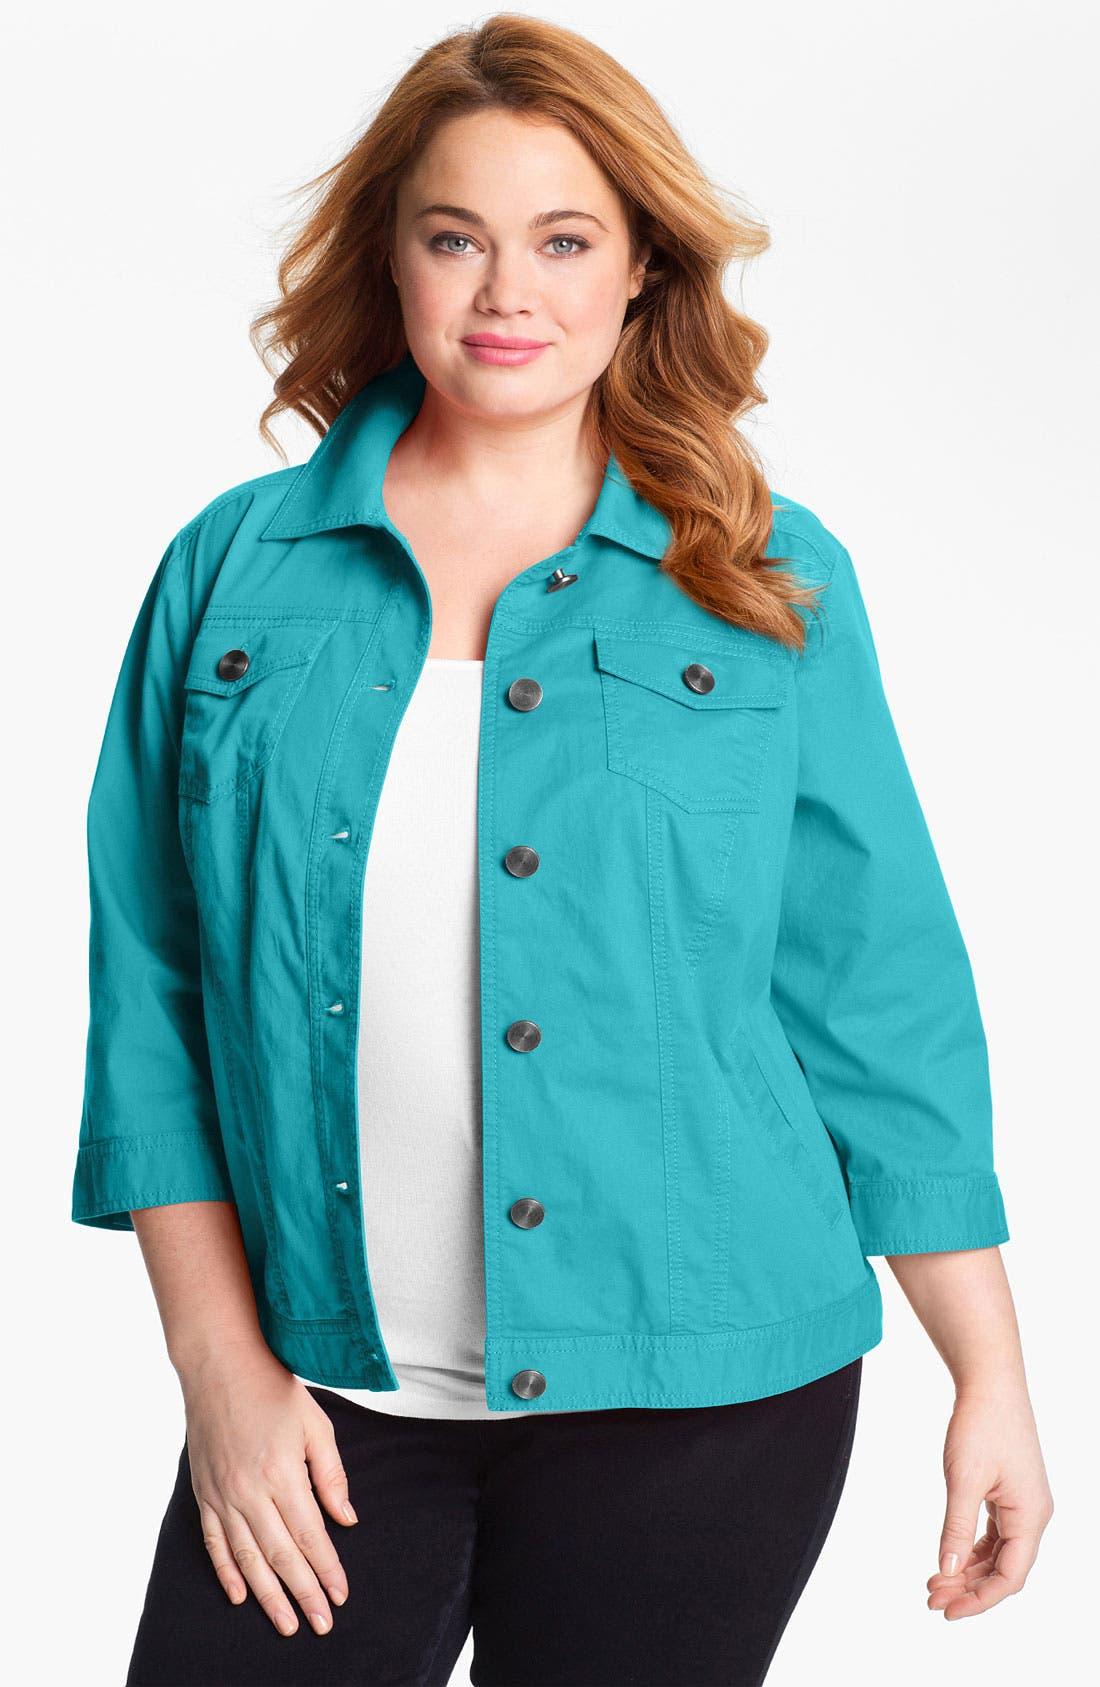 Alternate Image 1 Selected - Sejour 'Megan' Patch Pocket Jacket (Plus Size)